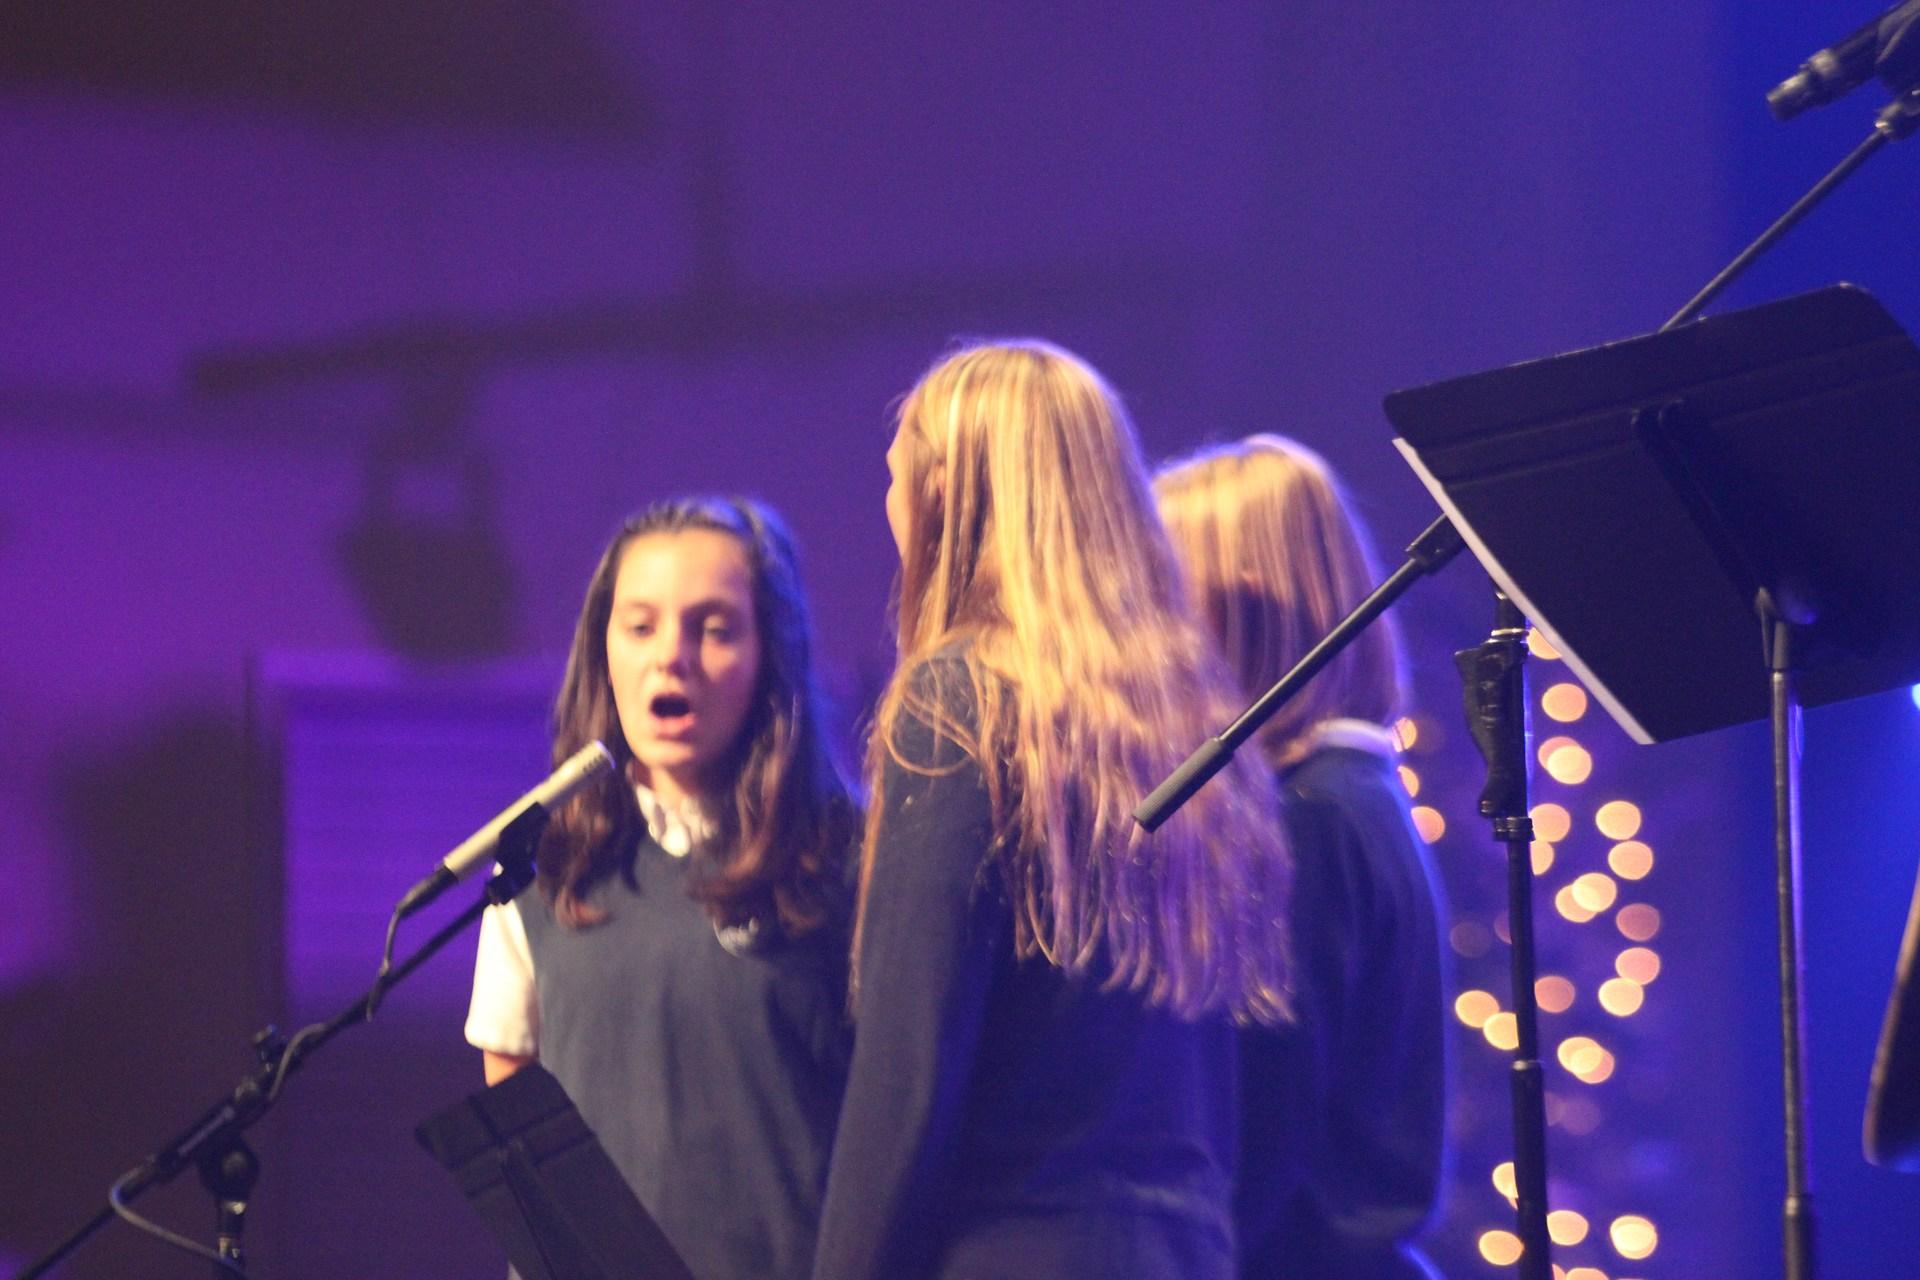 3 girls singing Christmas songs